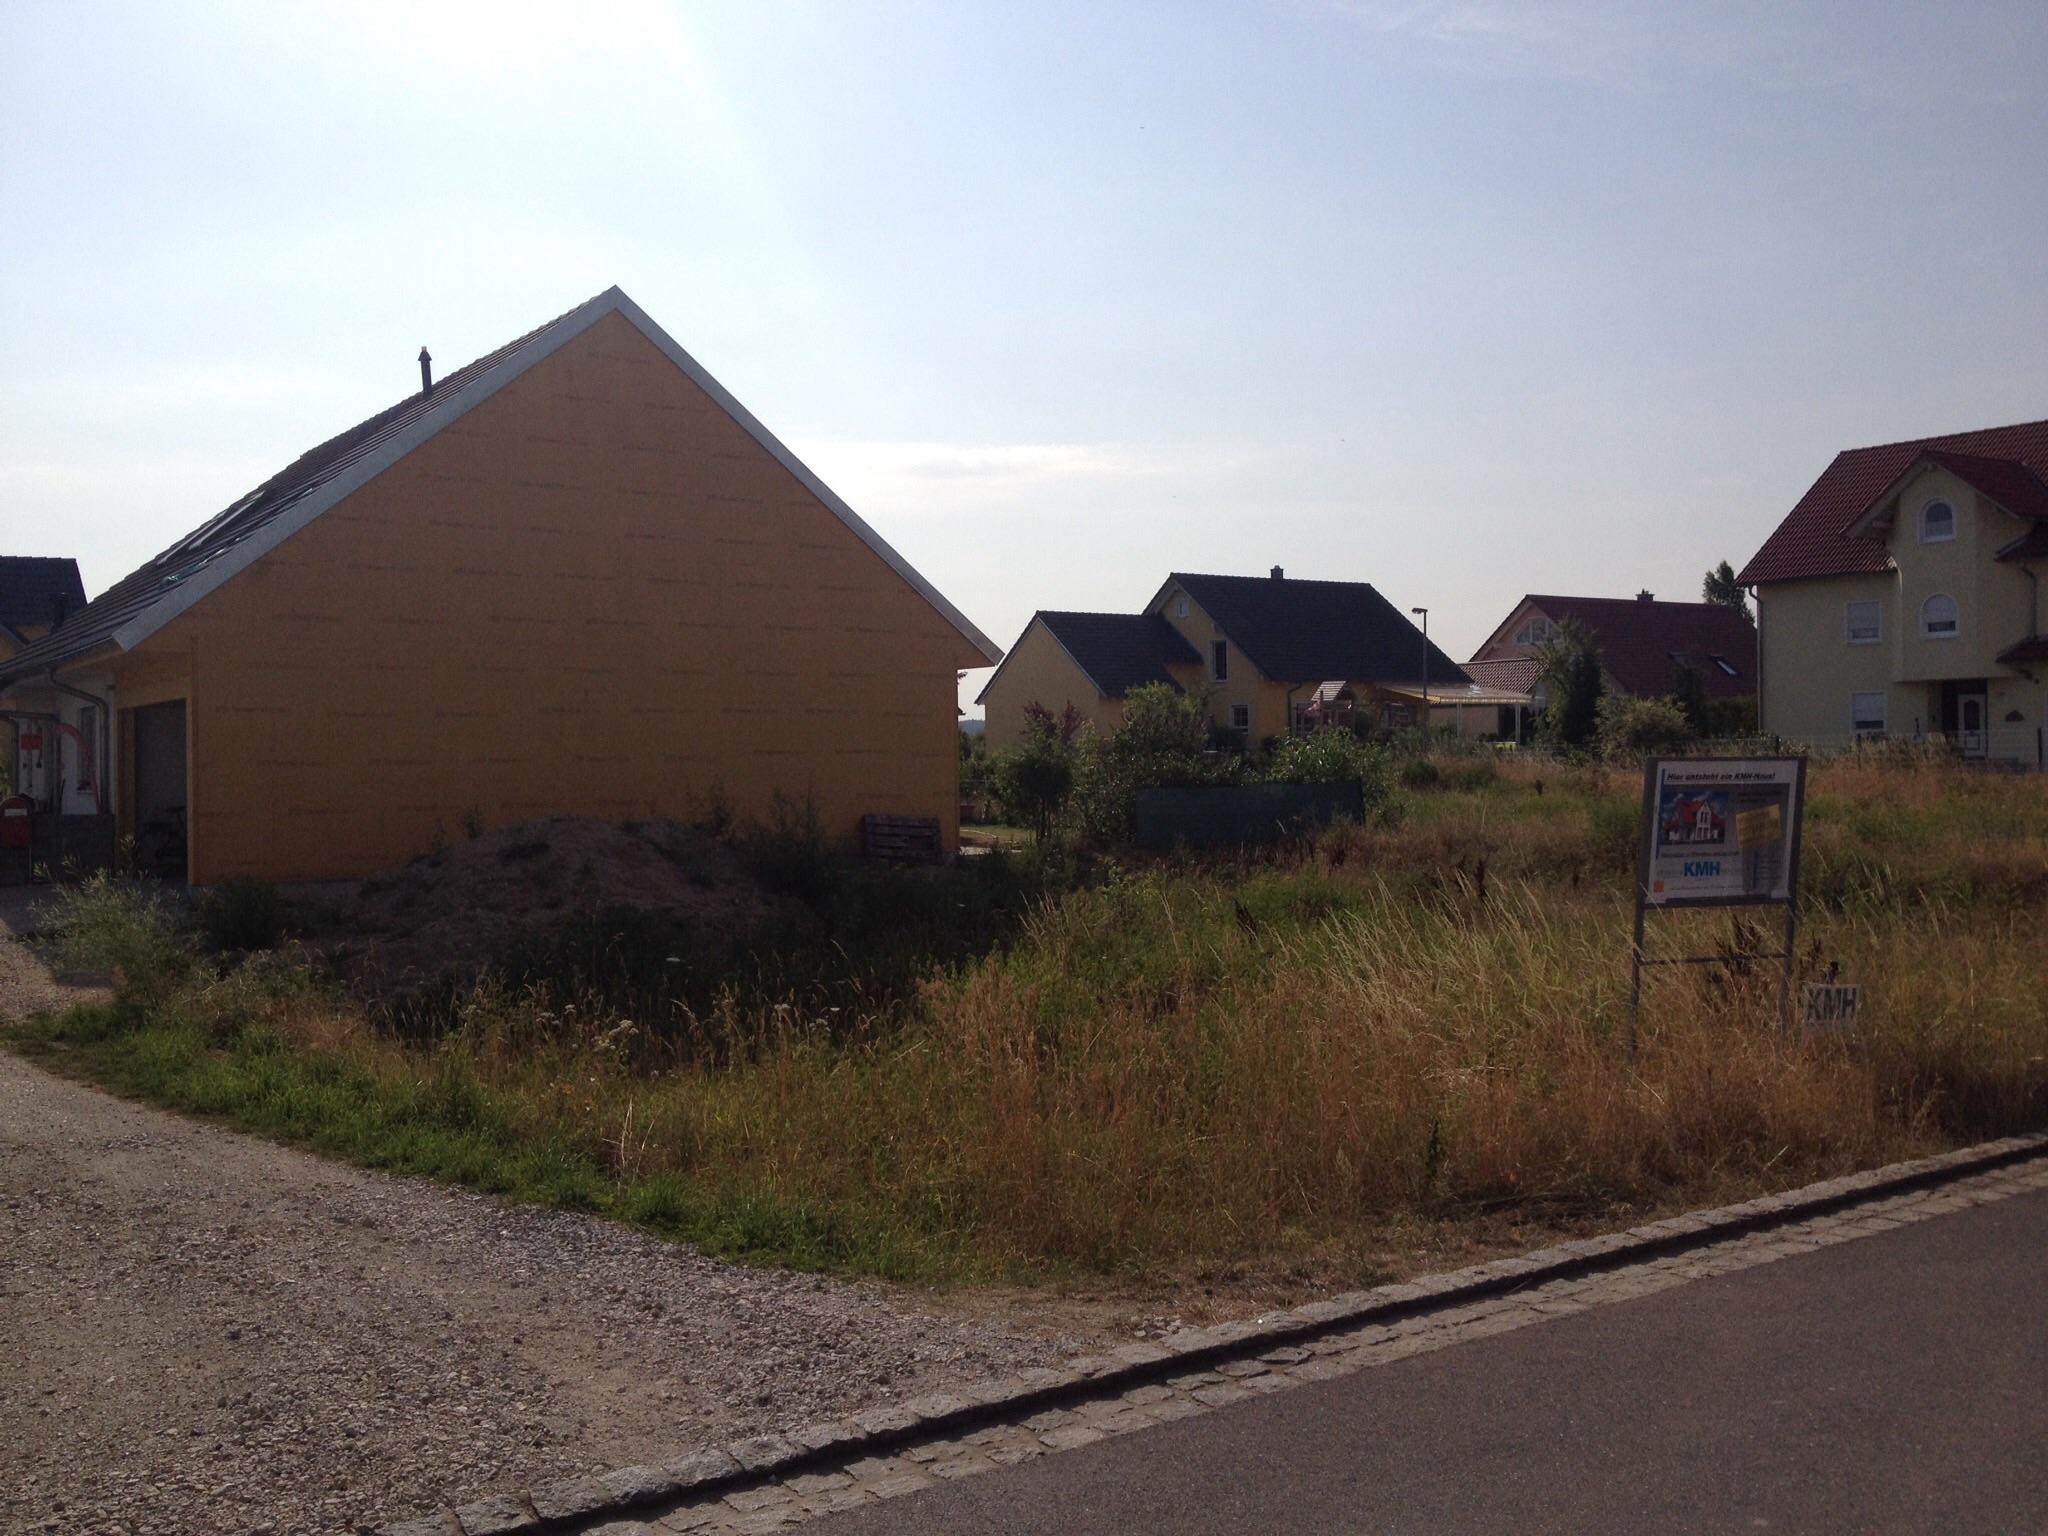 Kmh Haus fazit planungsphase projekt hausbau 2015